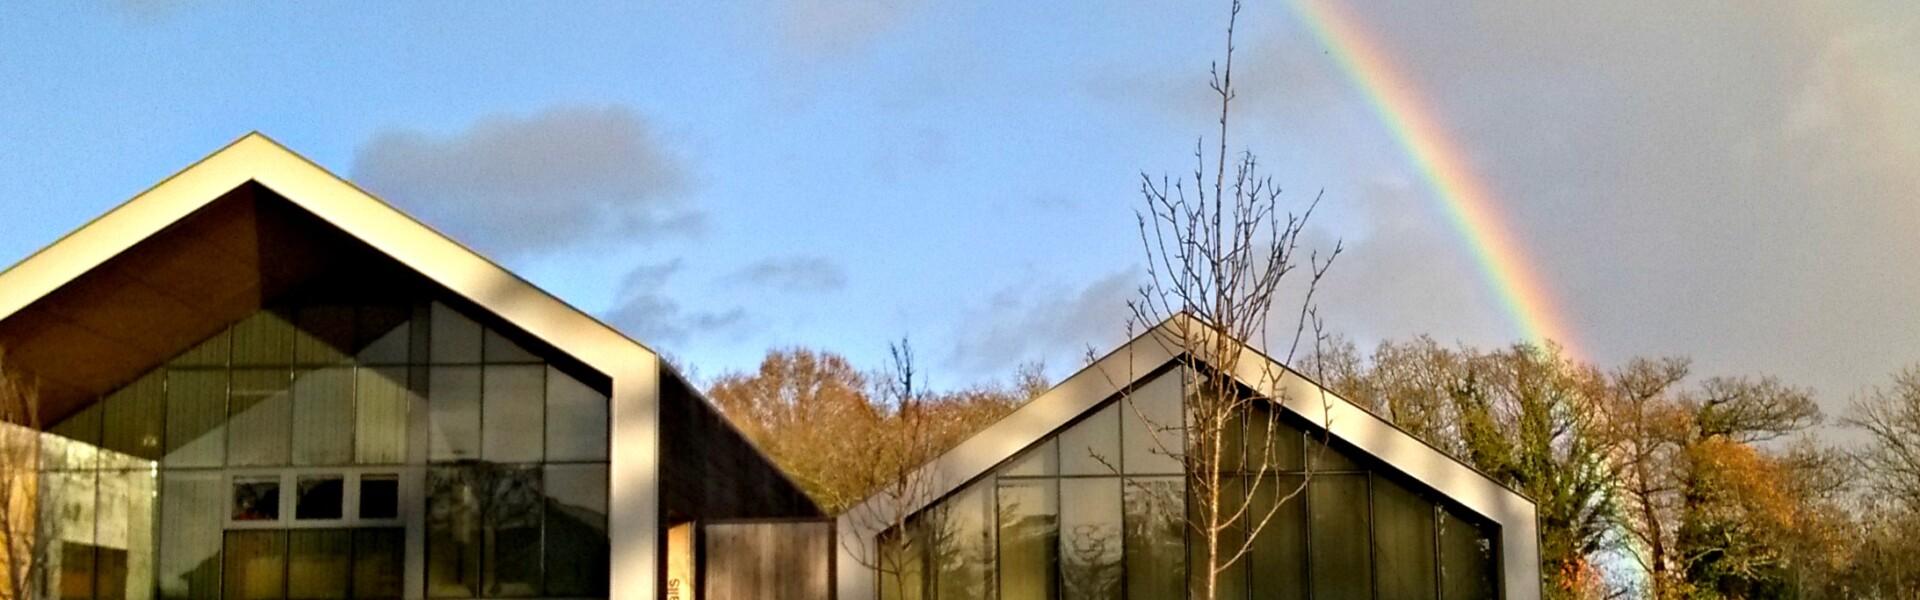 Etchingham village halls and rainbow